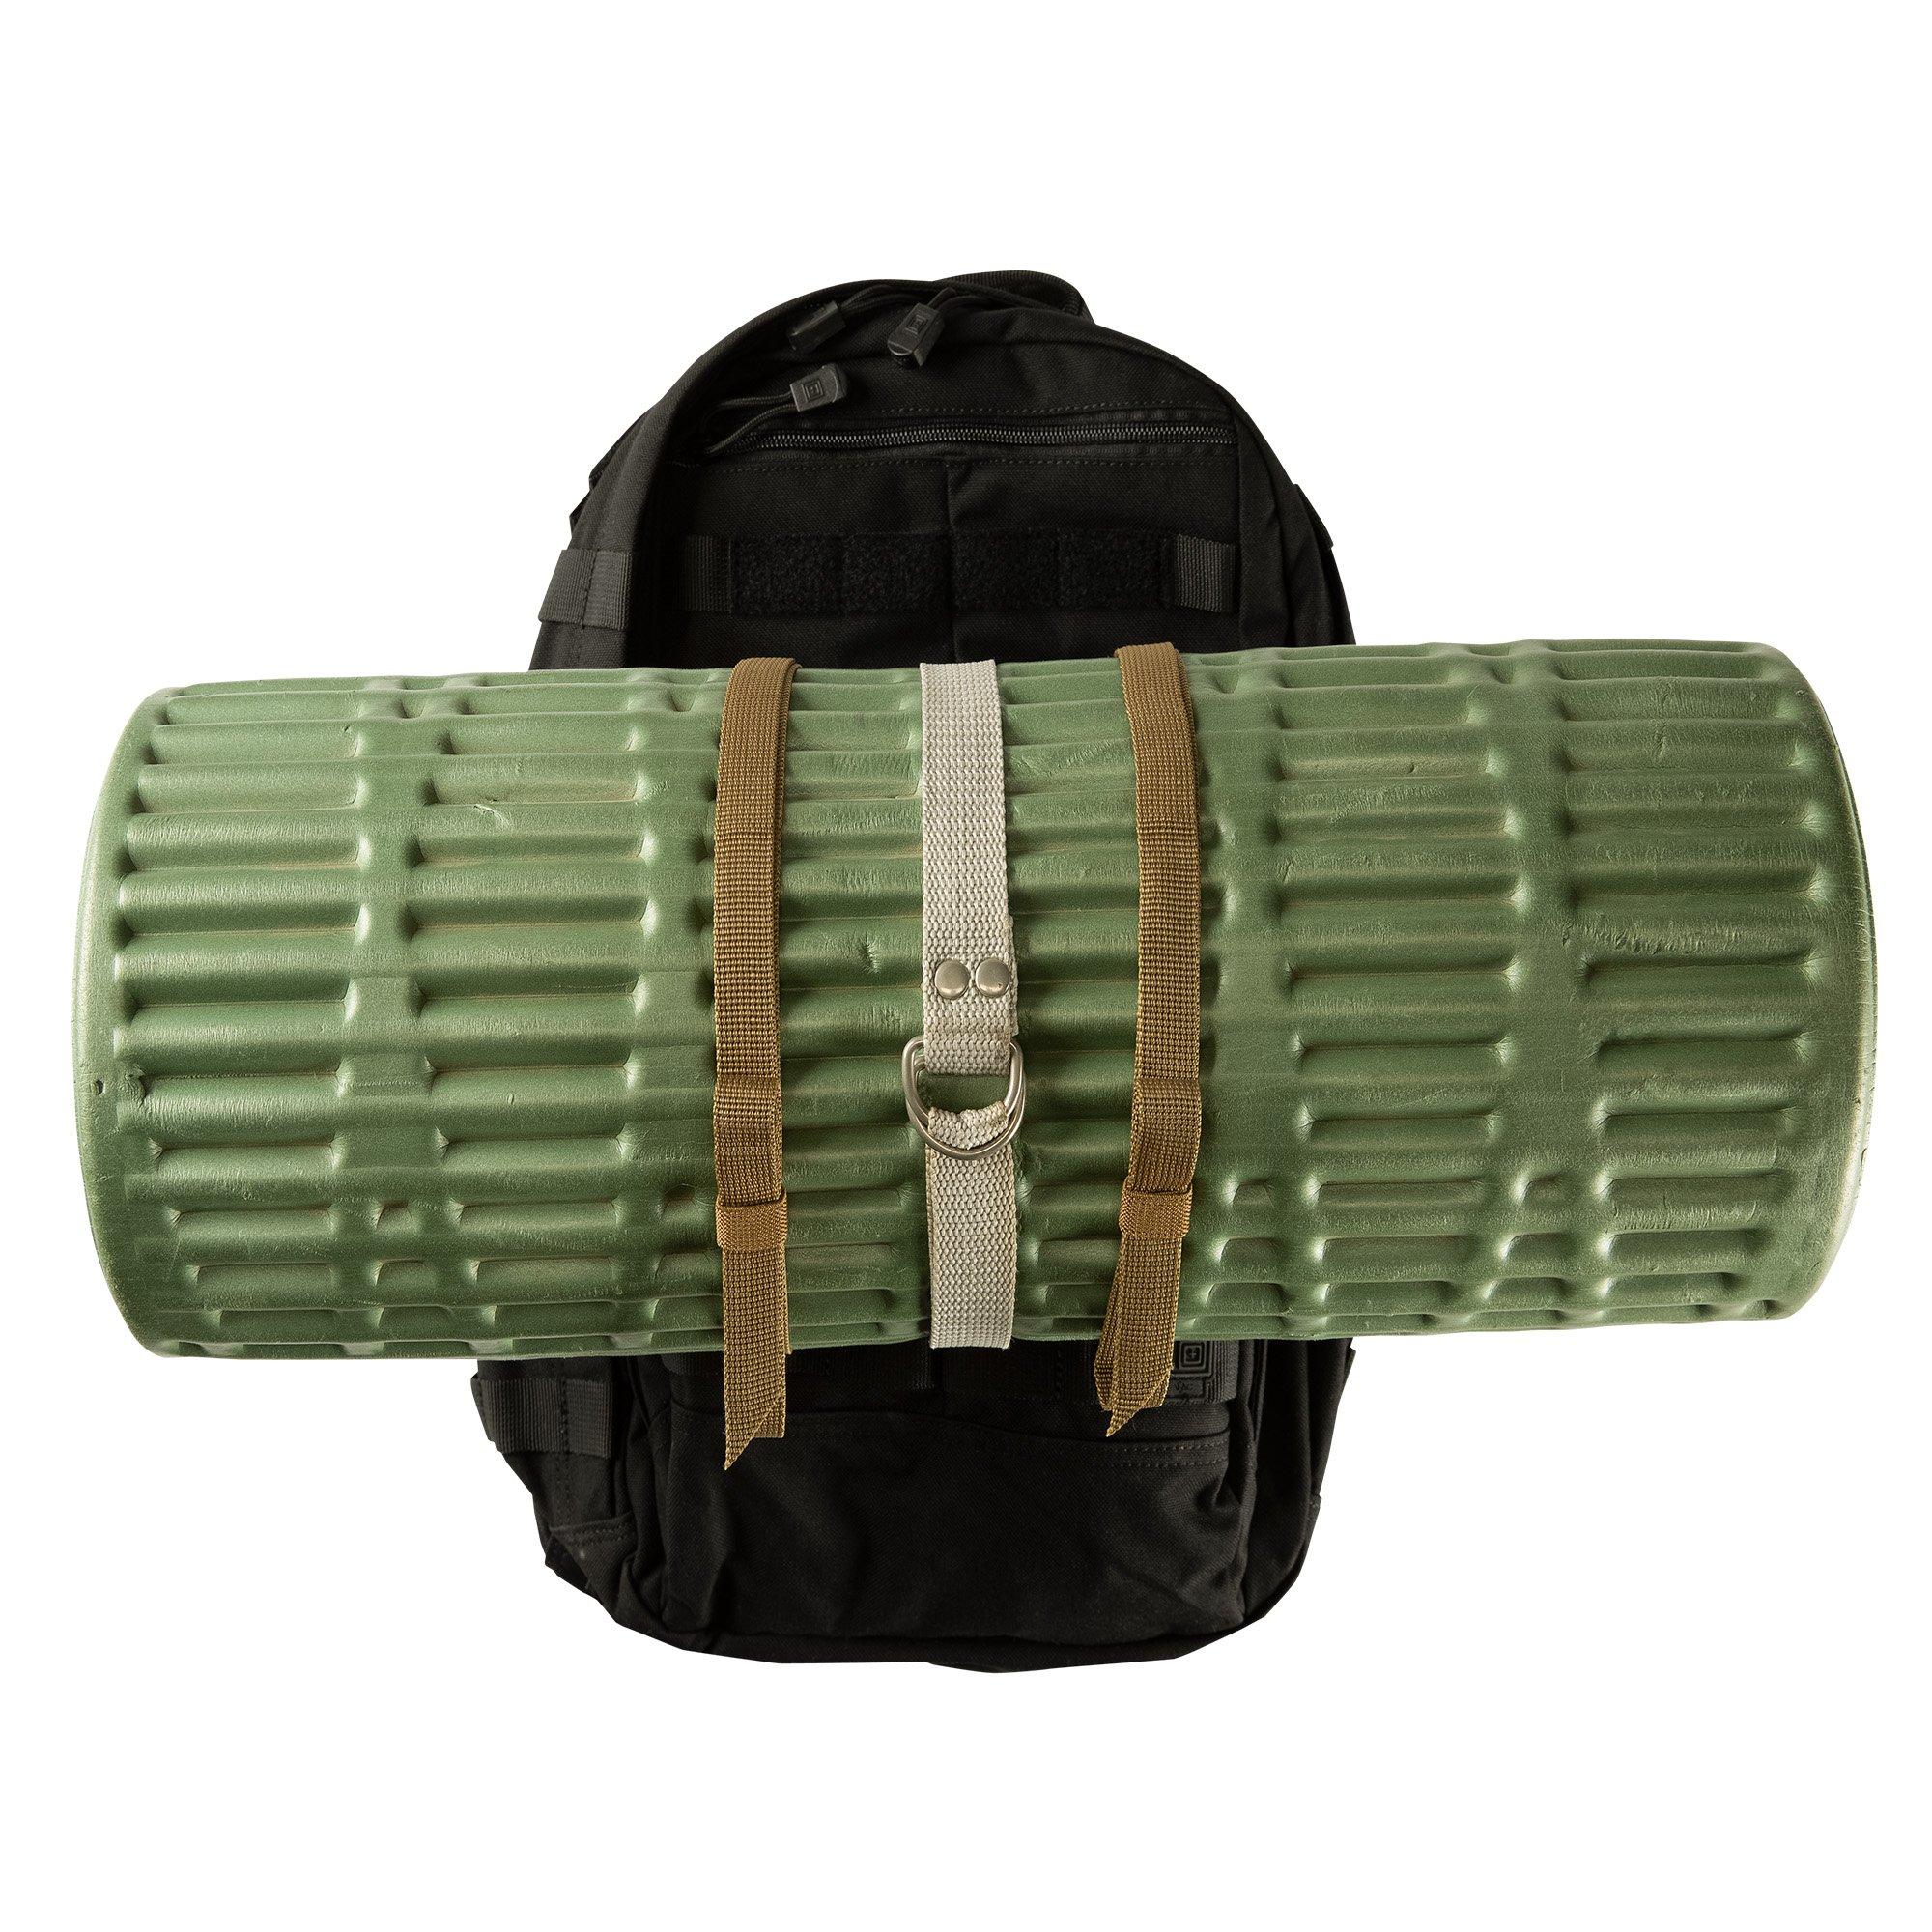 SIDEWINDER STRAPS LG 2PK – Ranger Green